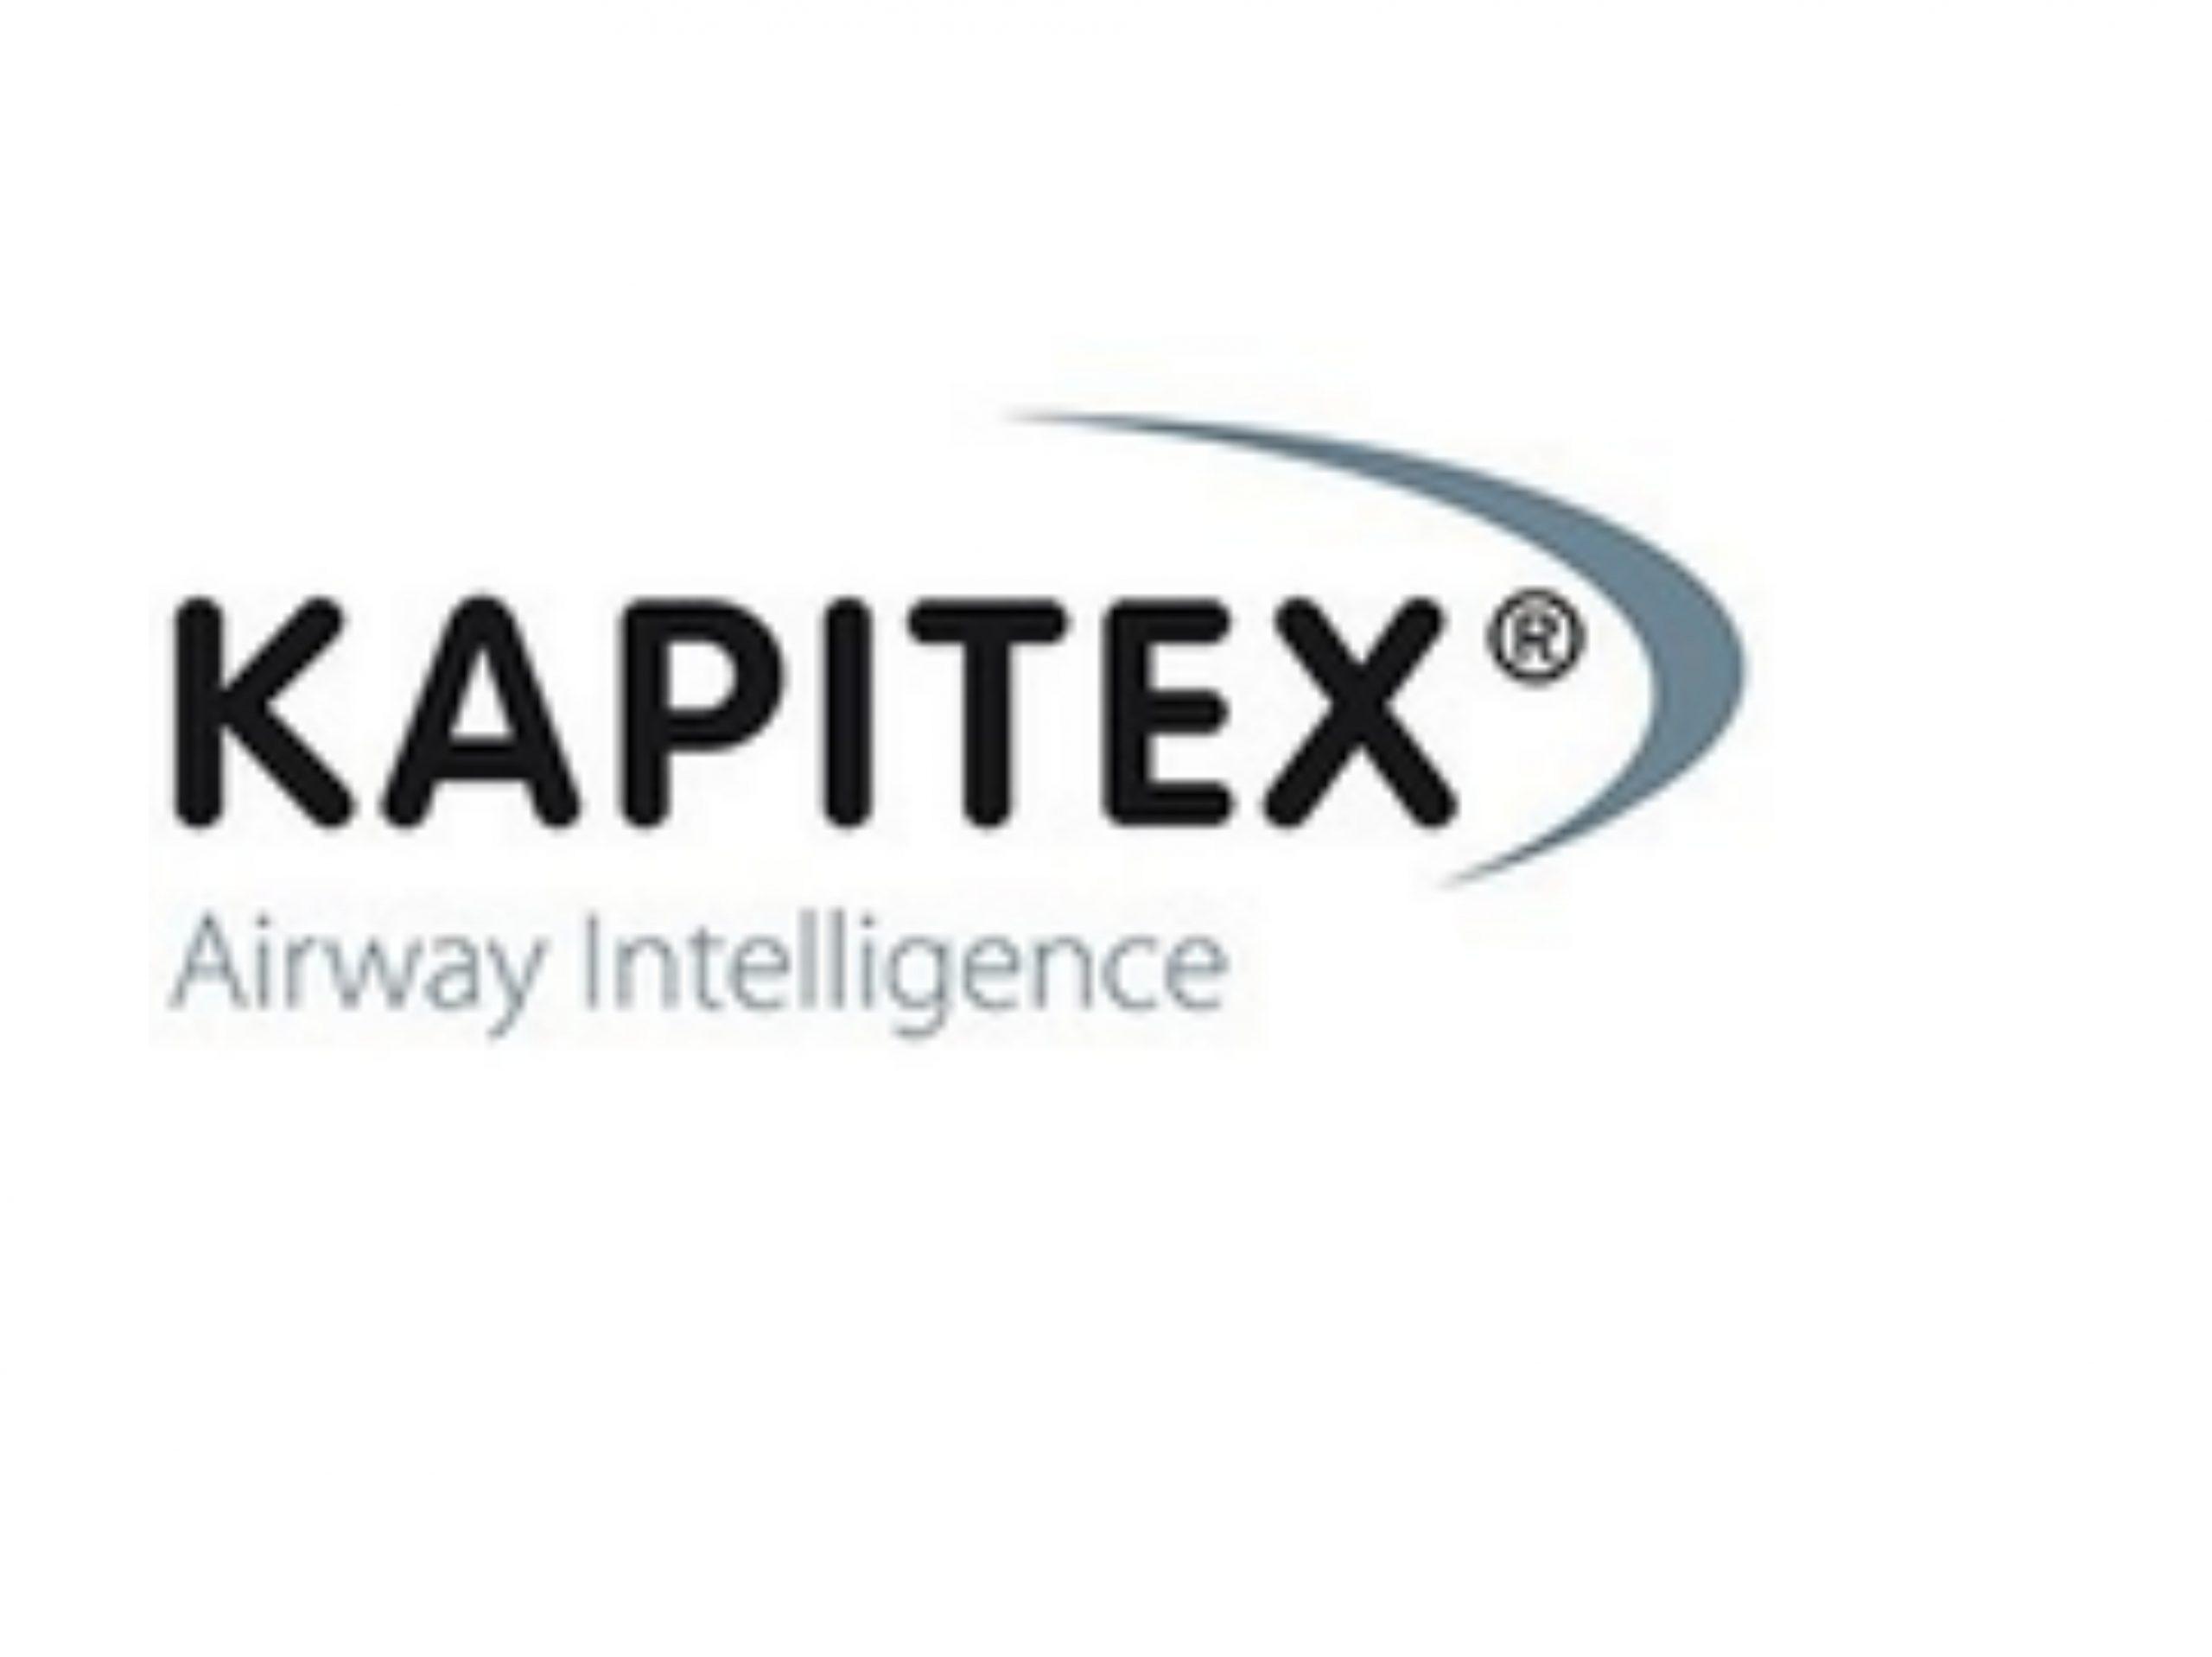 Kapitex Help Laryngectomy Patients Stranded in Turkey in Lockdown